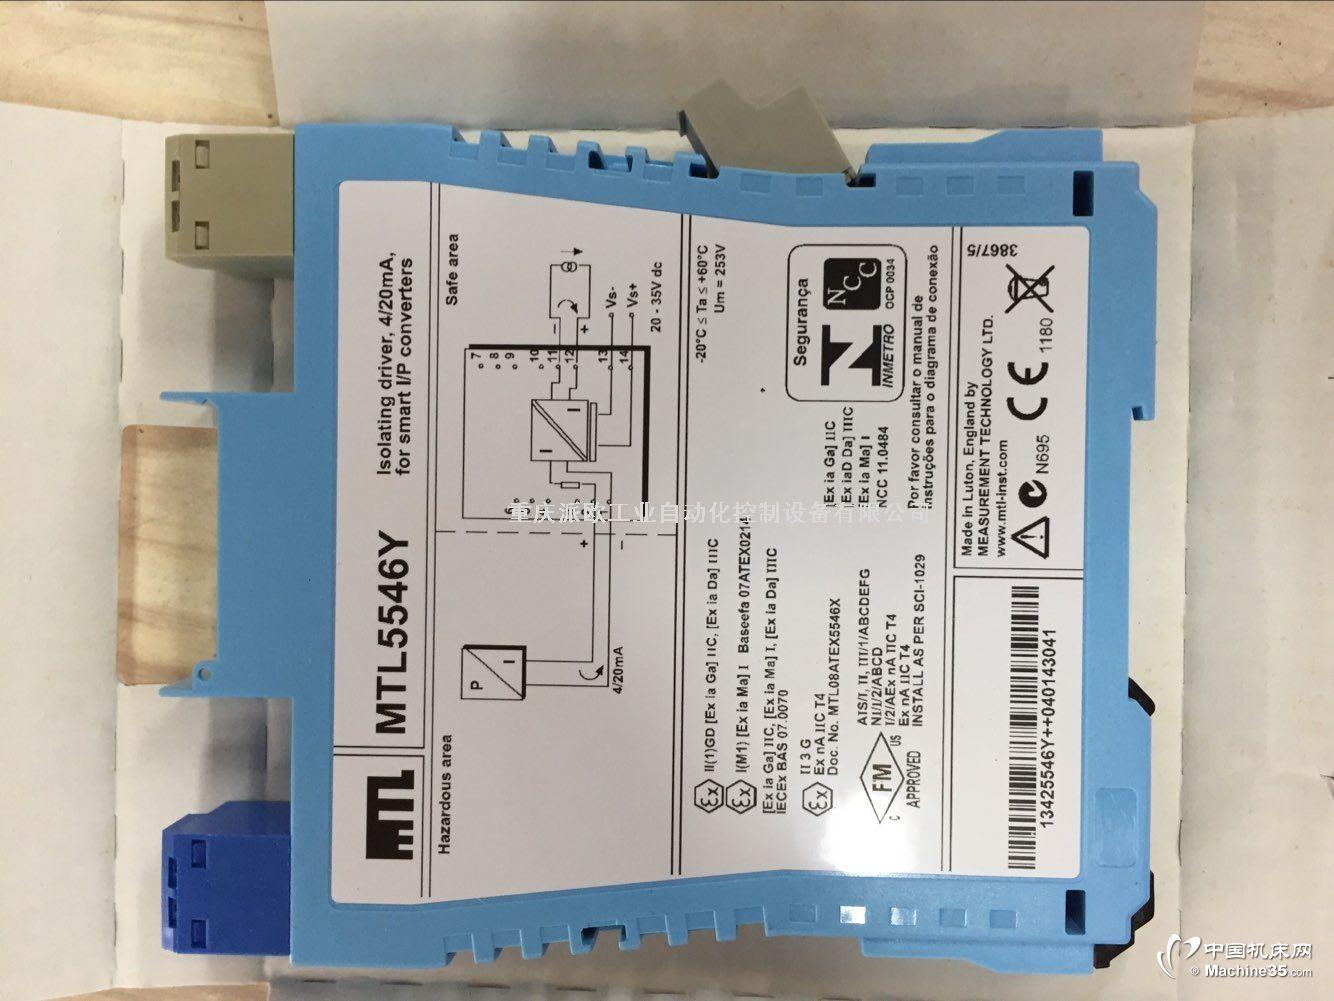 MTL5012英国进口安全栅现货